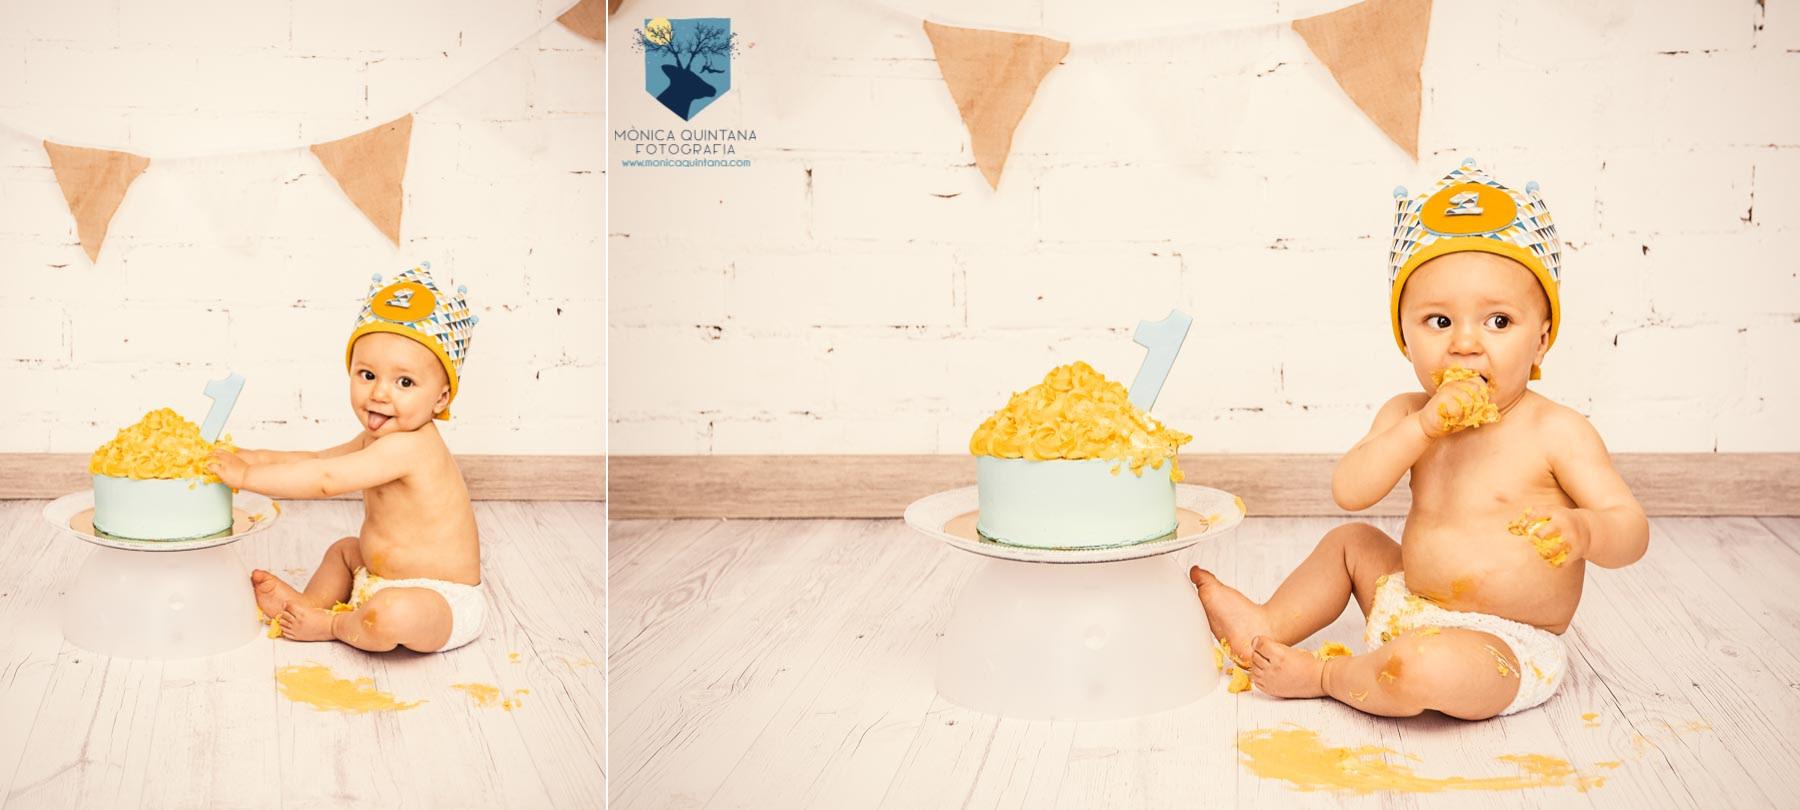 fotografia, fotografo, fotografa, estudio fotos, girona, figueres, emporda, monica quintana, bebes, niños, familia, retrato, cumpleaños, un año, smash the cake, celebracion, fiesta, pastel, hermanos